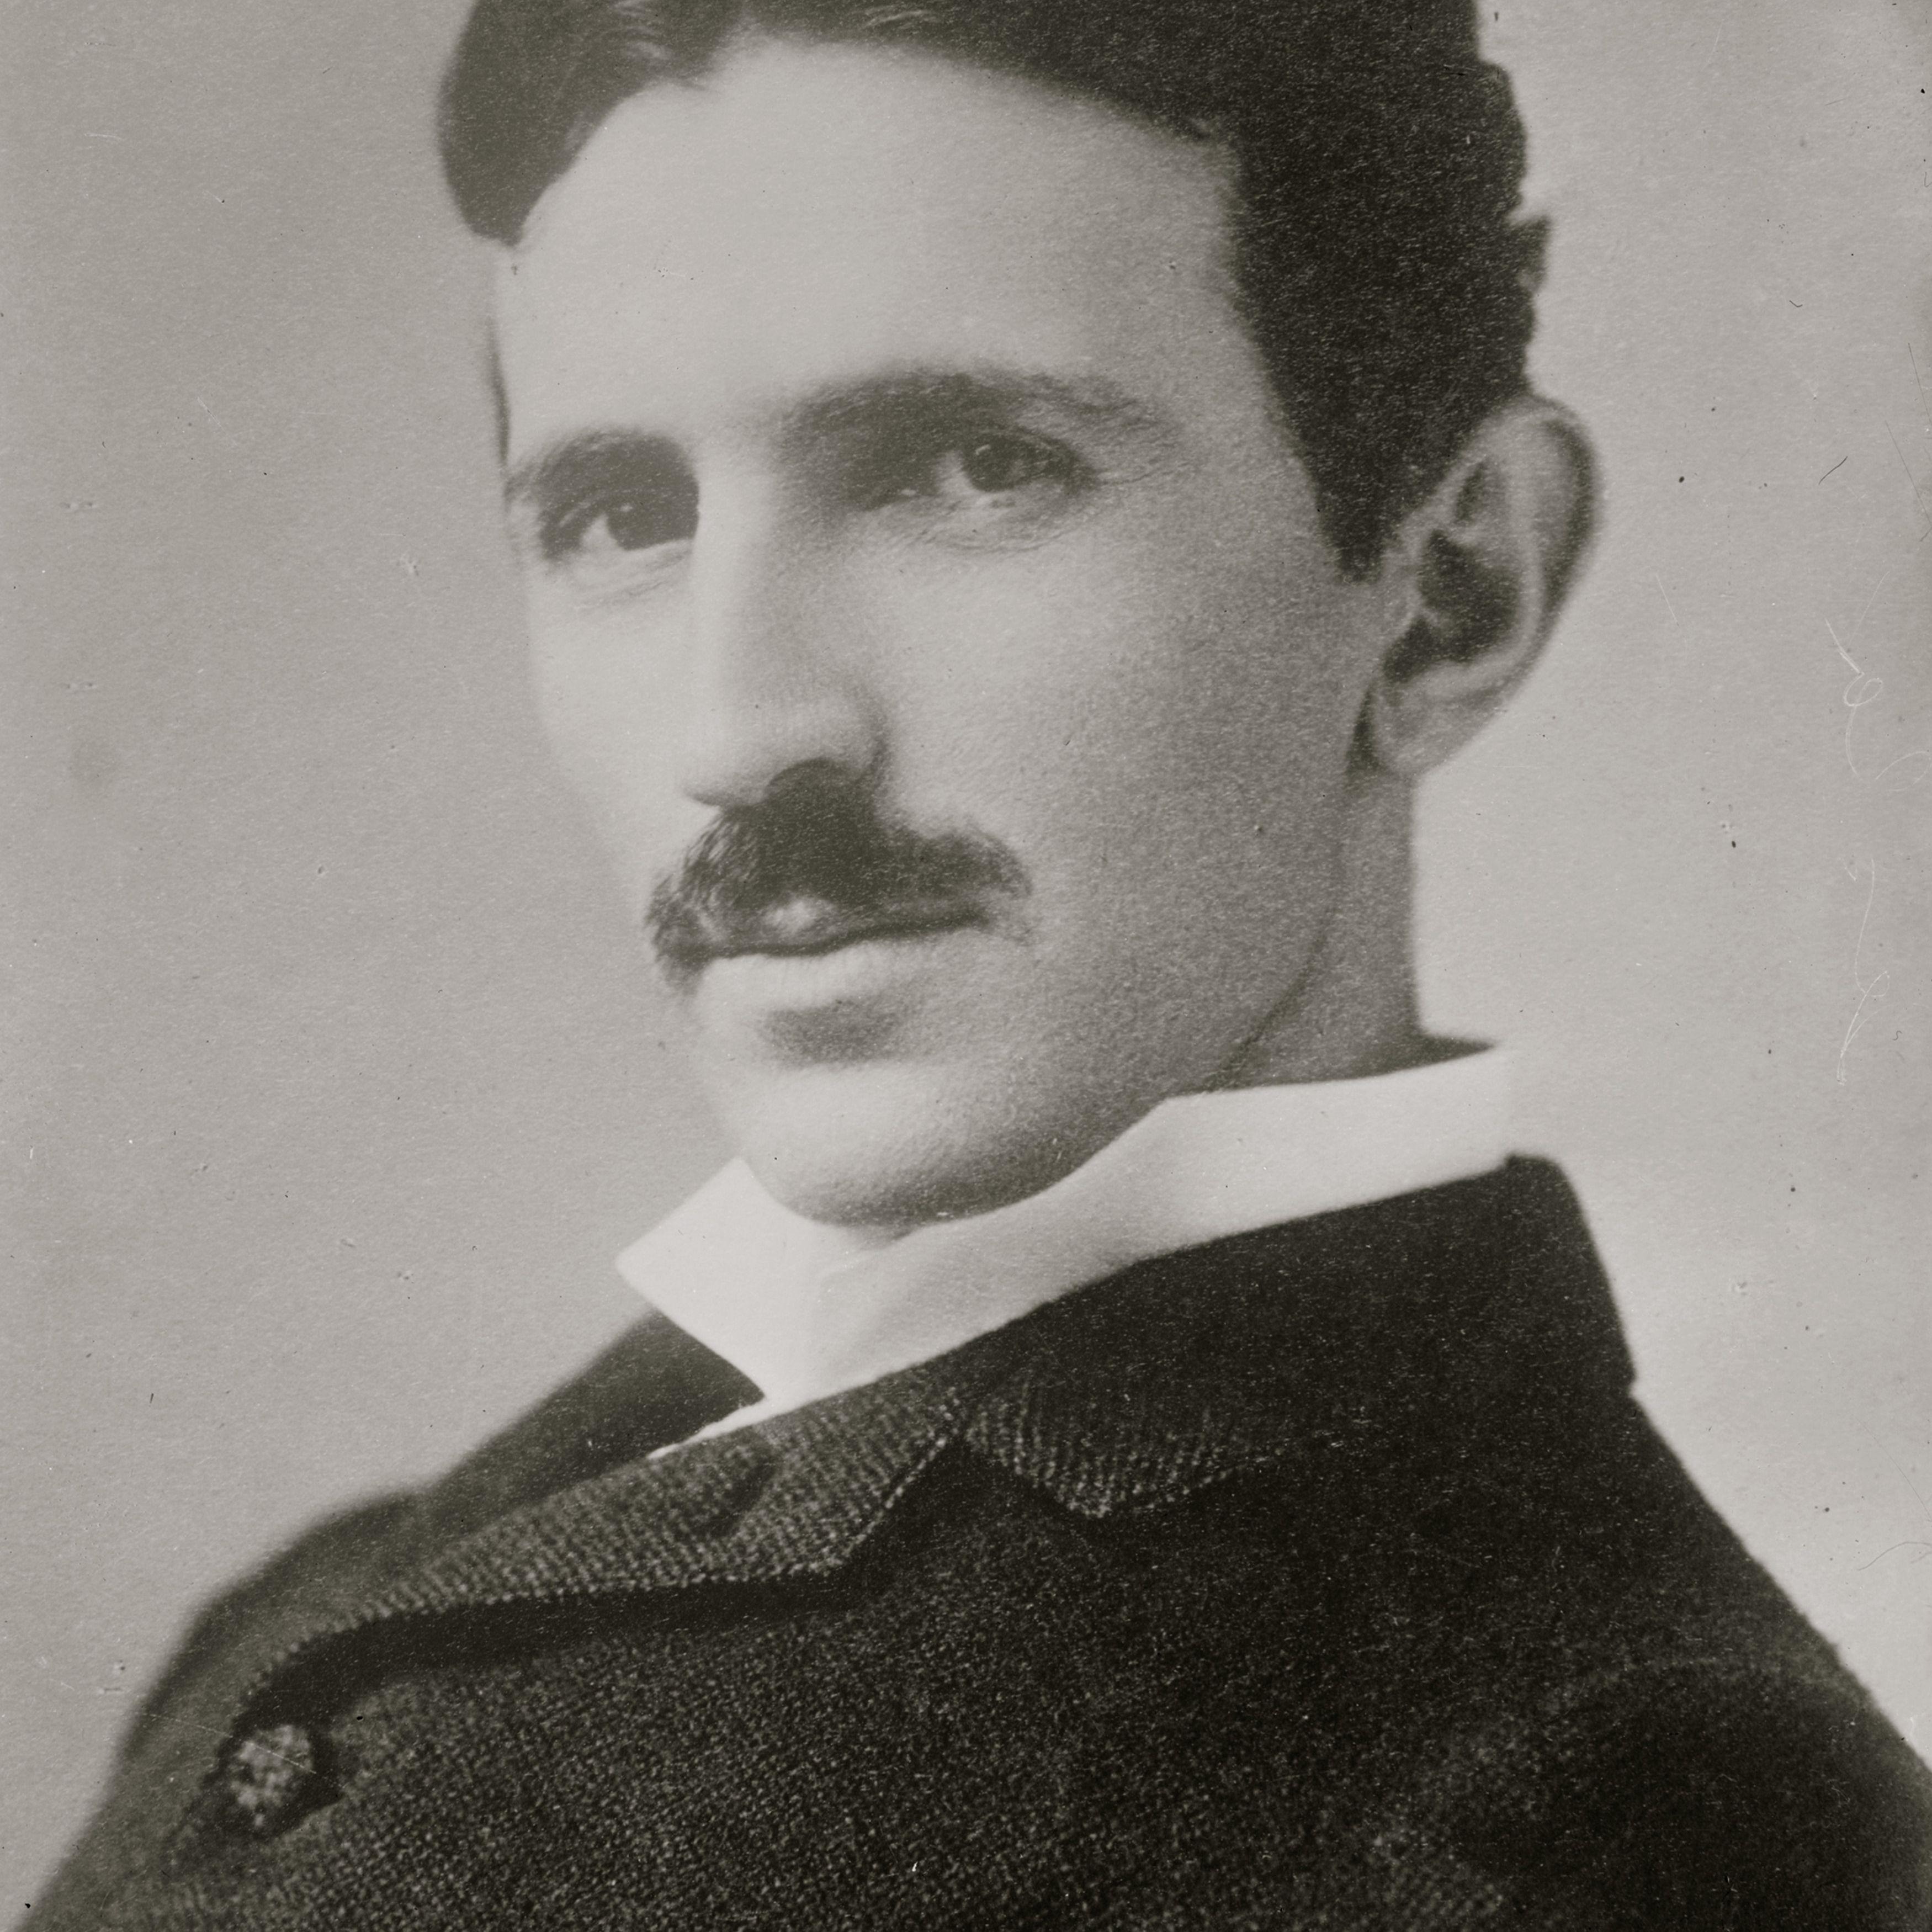 Portrait of Serbian born inventor and engineer Nicola Tesla (1856 - 1943), 1906.